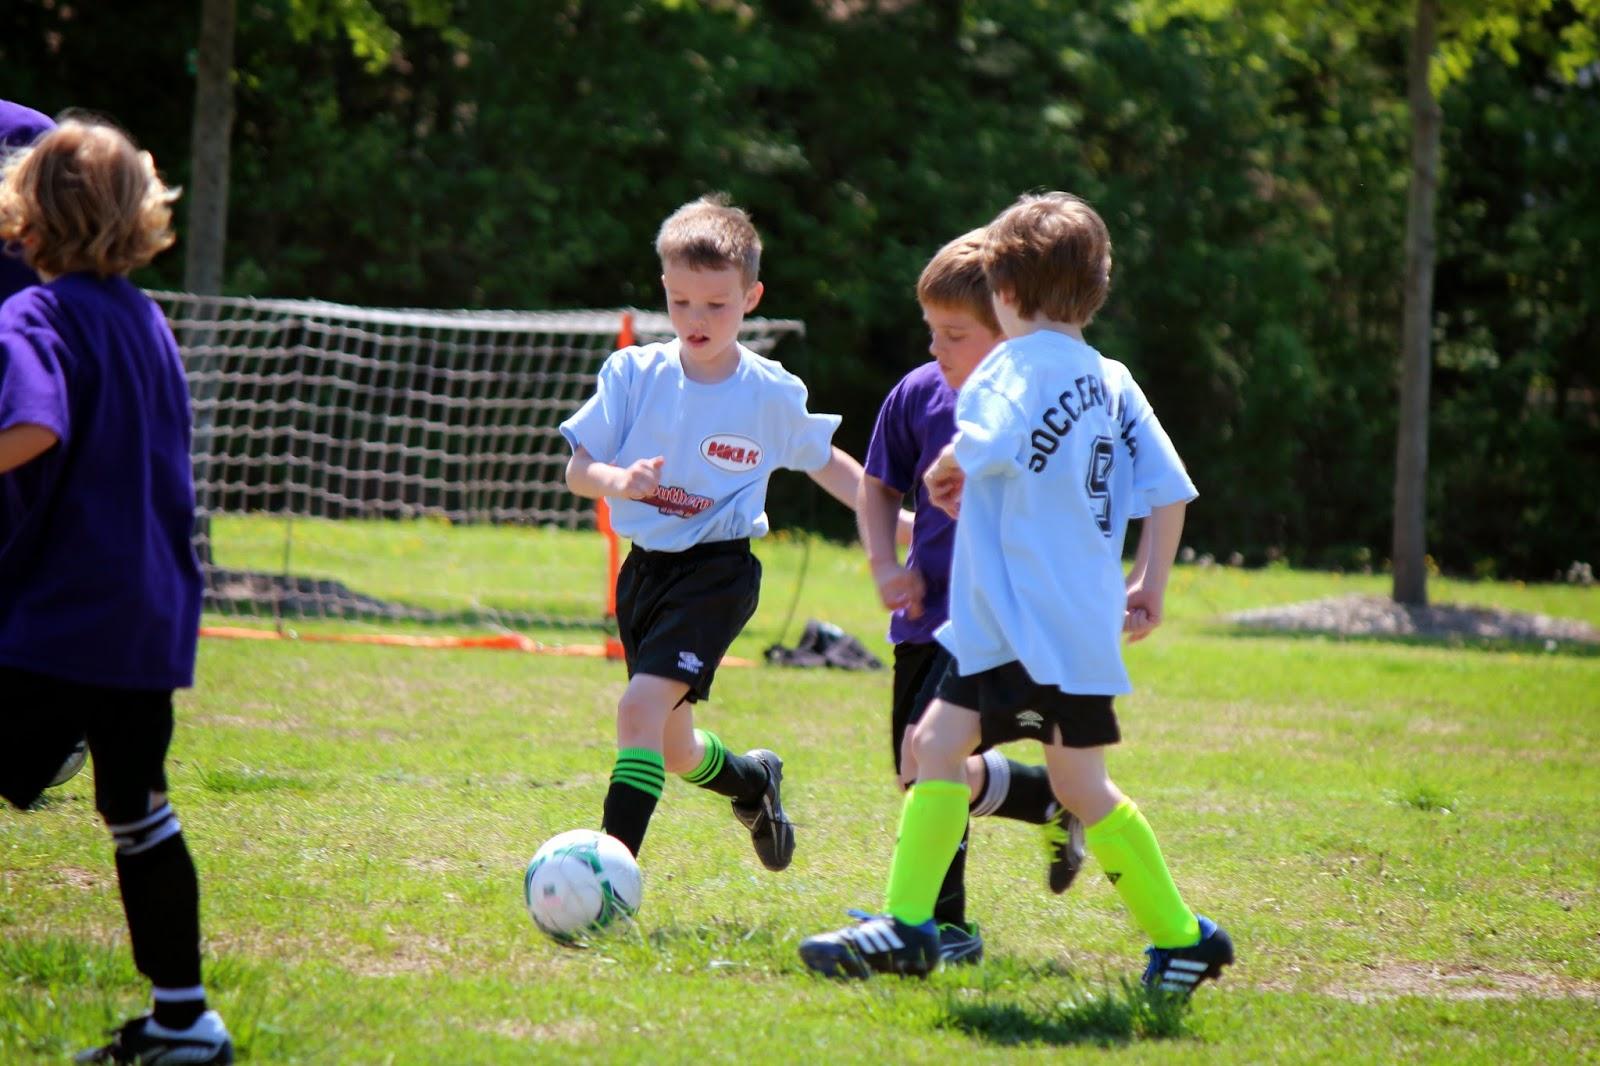 Troy soccer - Spring 2014